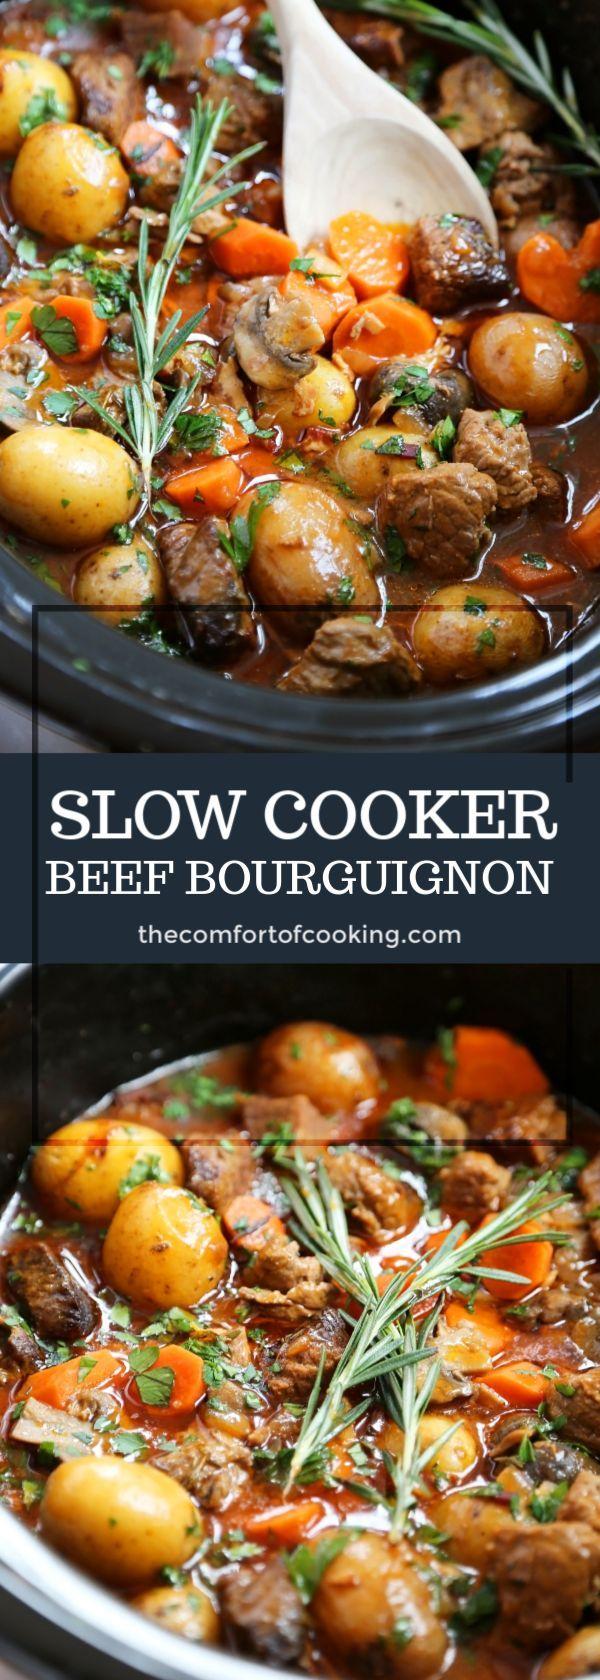 Slow Cooker Beef Bourguignon Beef Bourguignon Beef Recipes Food Recipes